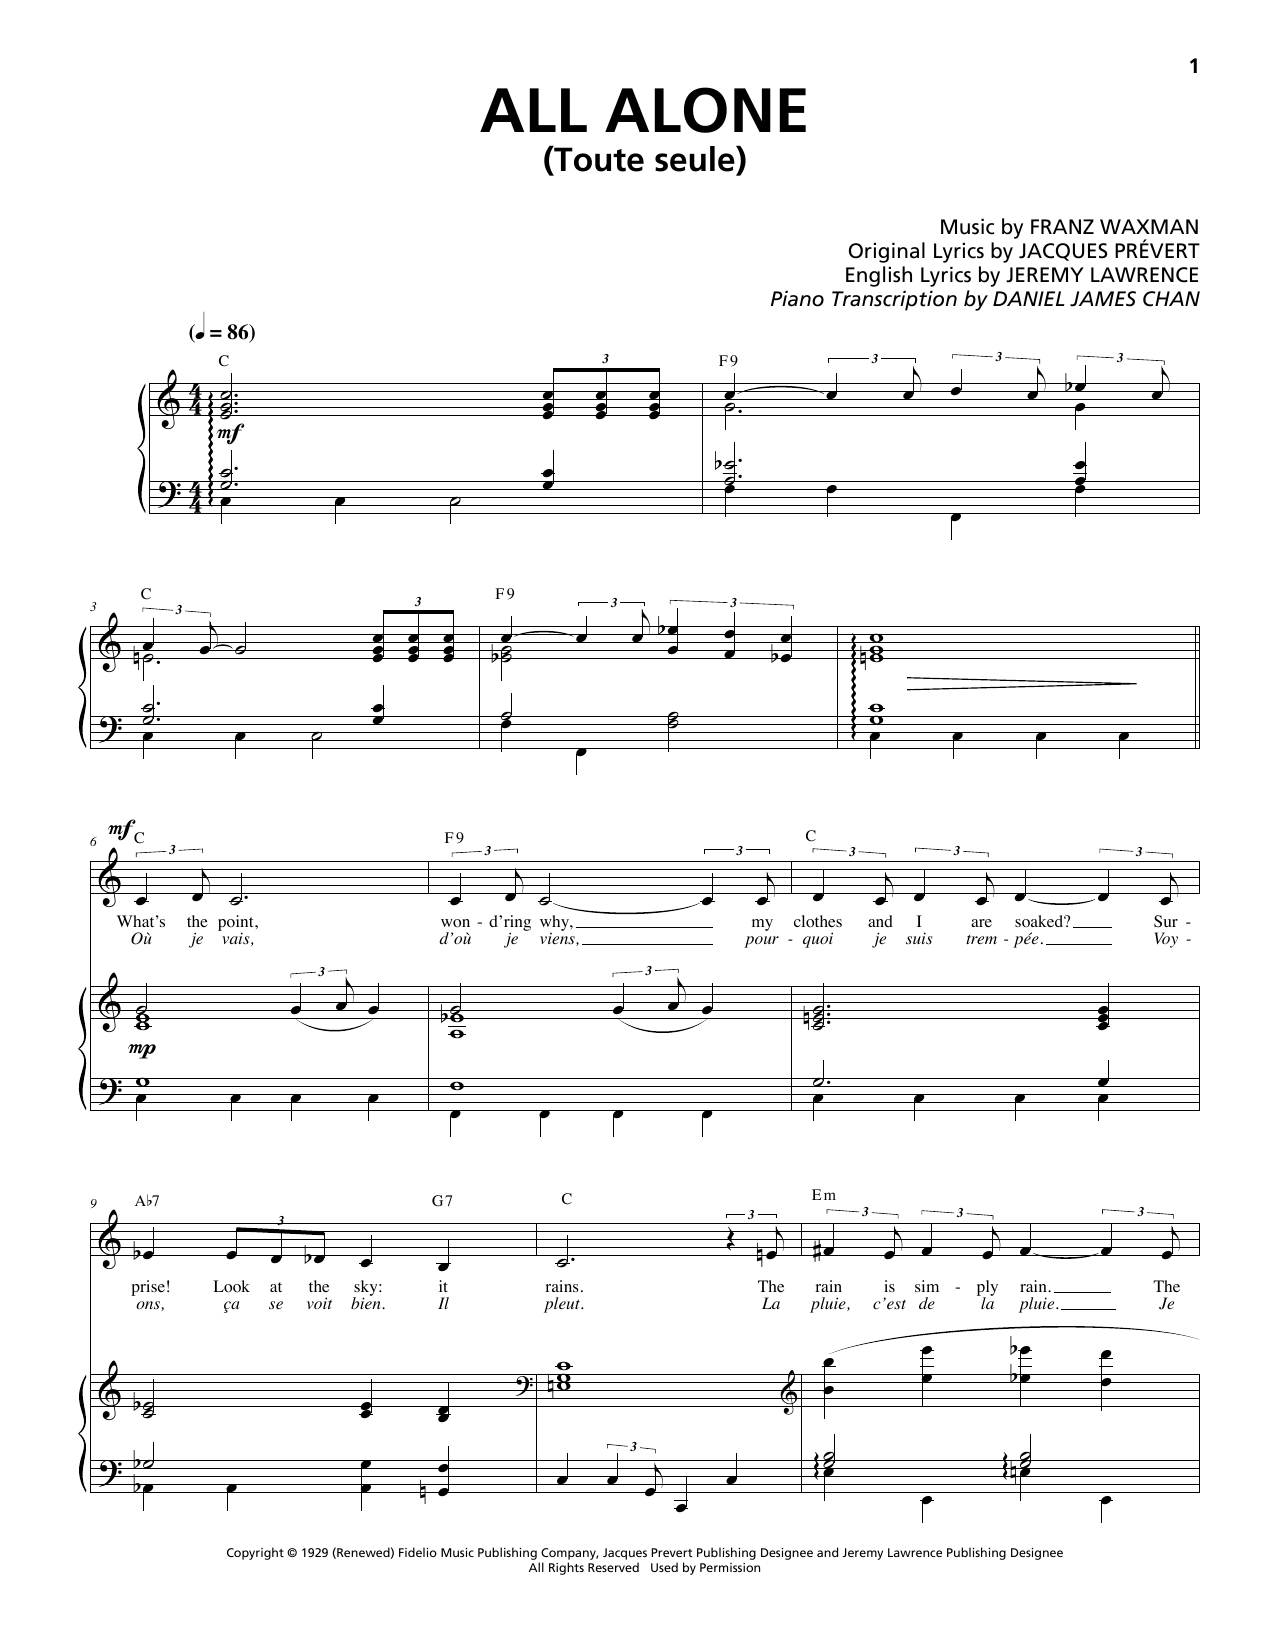 Franz Waxman - All Alone (Toute Seule)